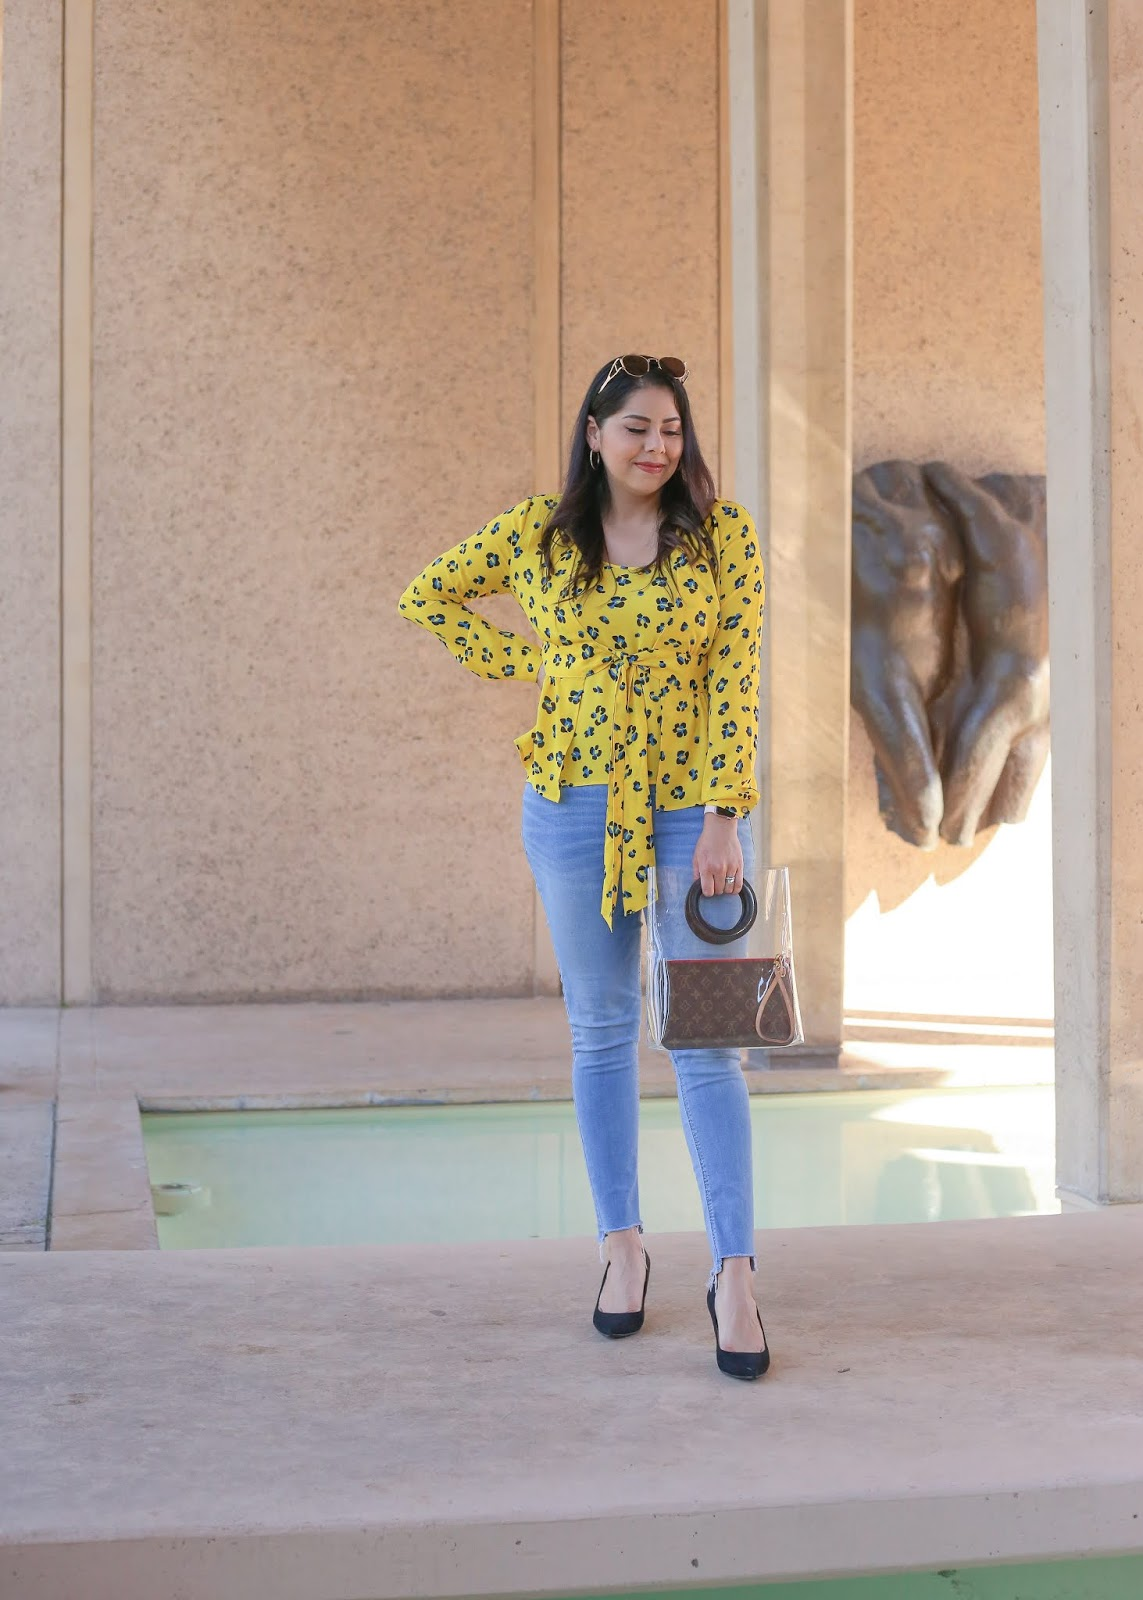 san diego fashion blogger in balboa park, panama 66 inside balboa park